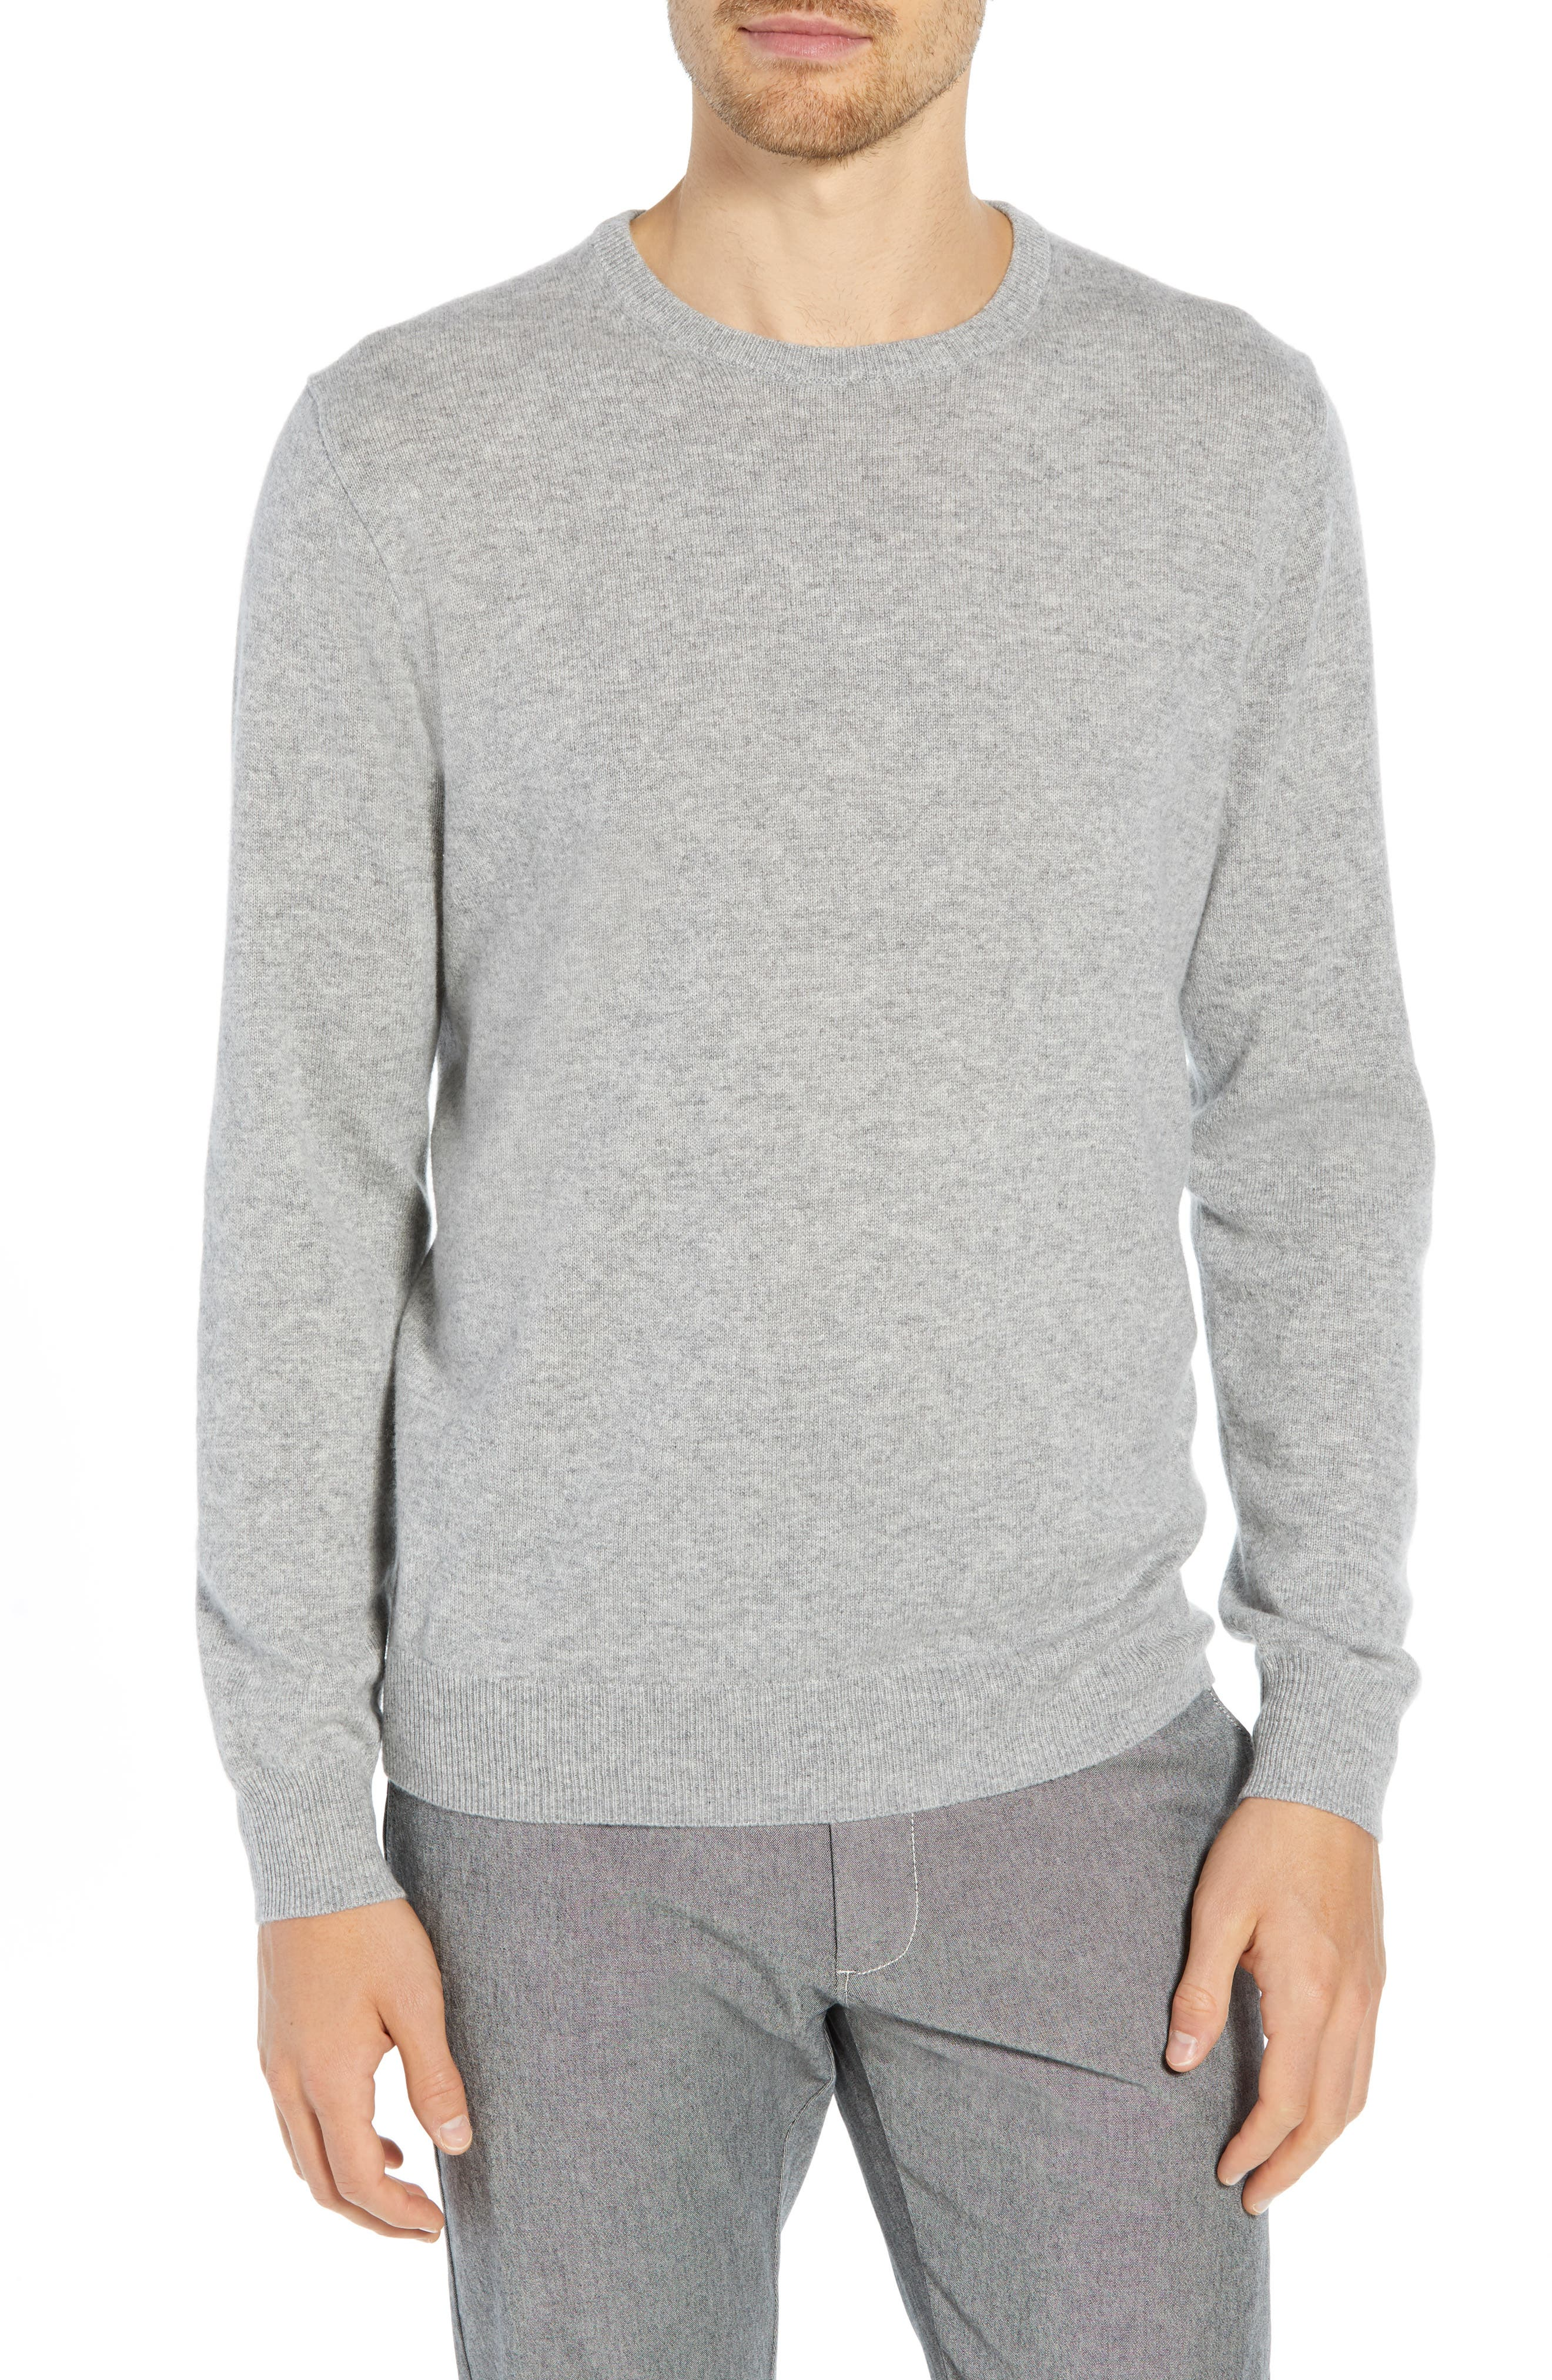 Everyday Cashmere Regular Fit Crewneck Sweater,                             Main thumbnail 1, color,                             HEATHER GREY